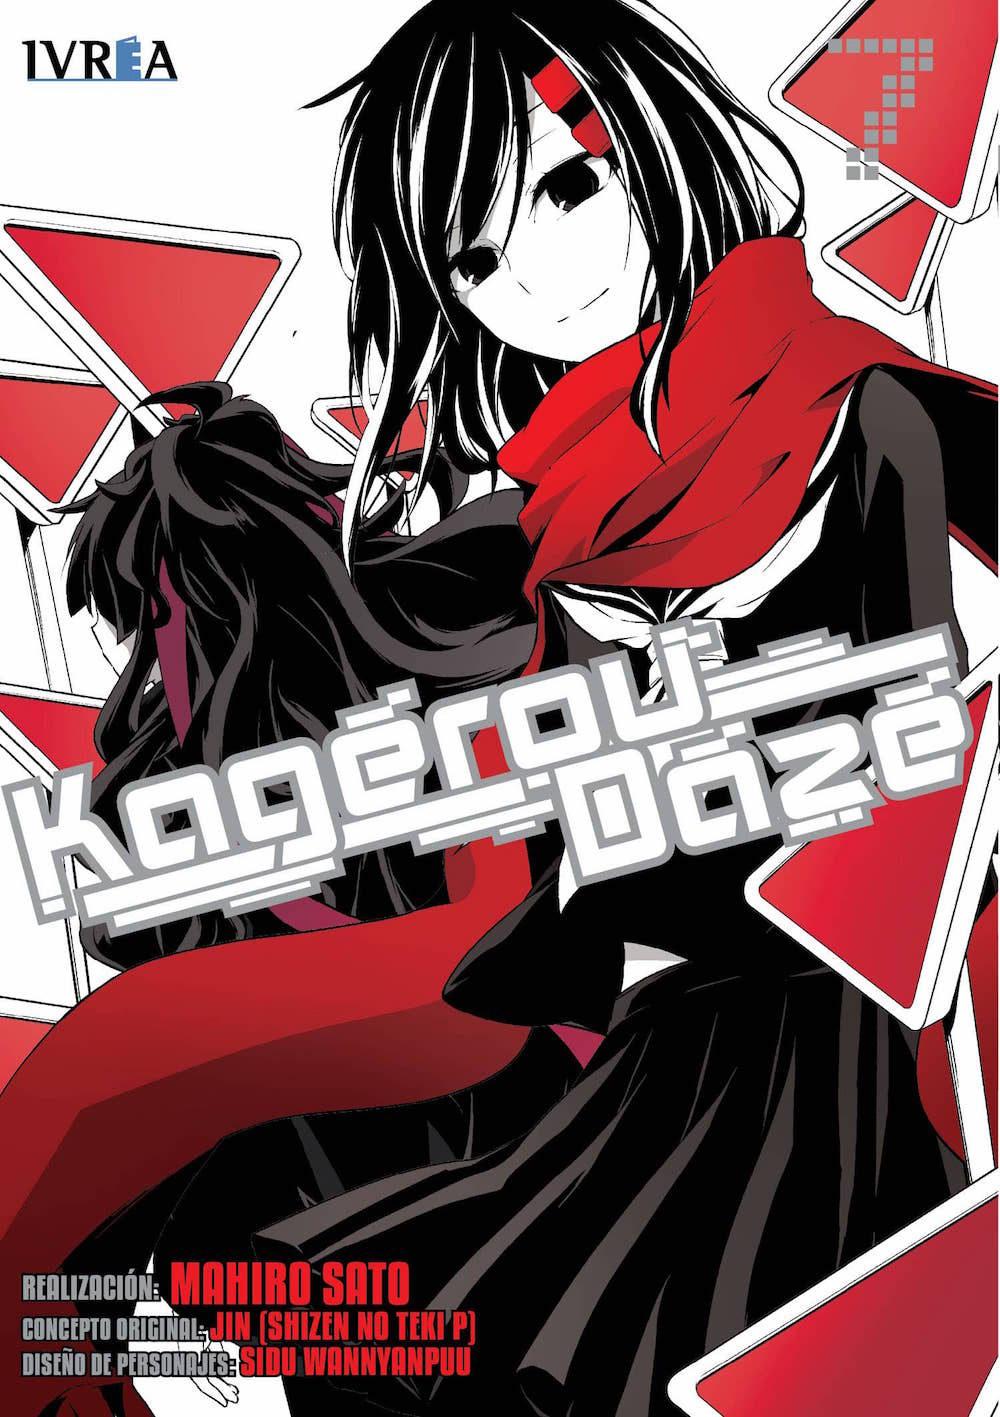 Kagerou Daze Nº 7 por Mahiro Satou;                                                                                                                                                                                                          Jin (zhinzen No Teki-p) epub